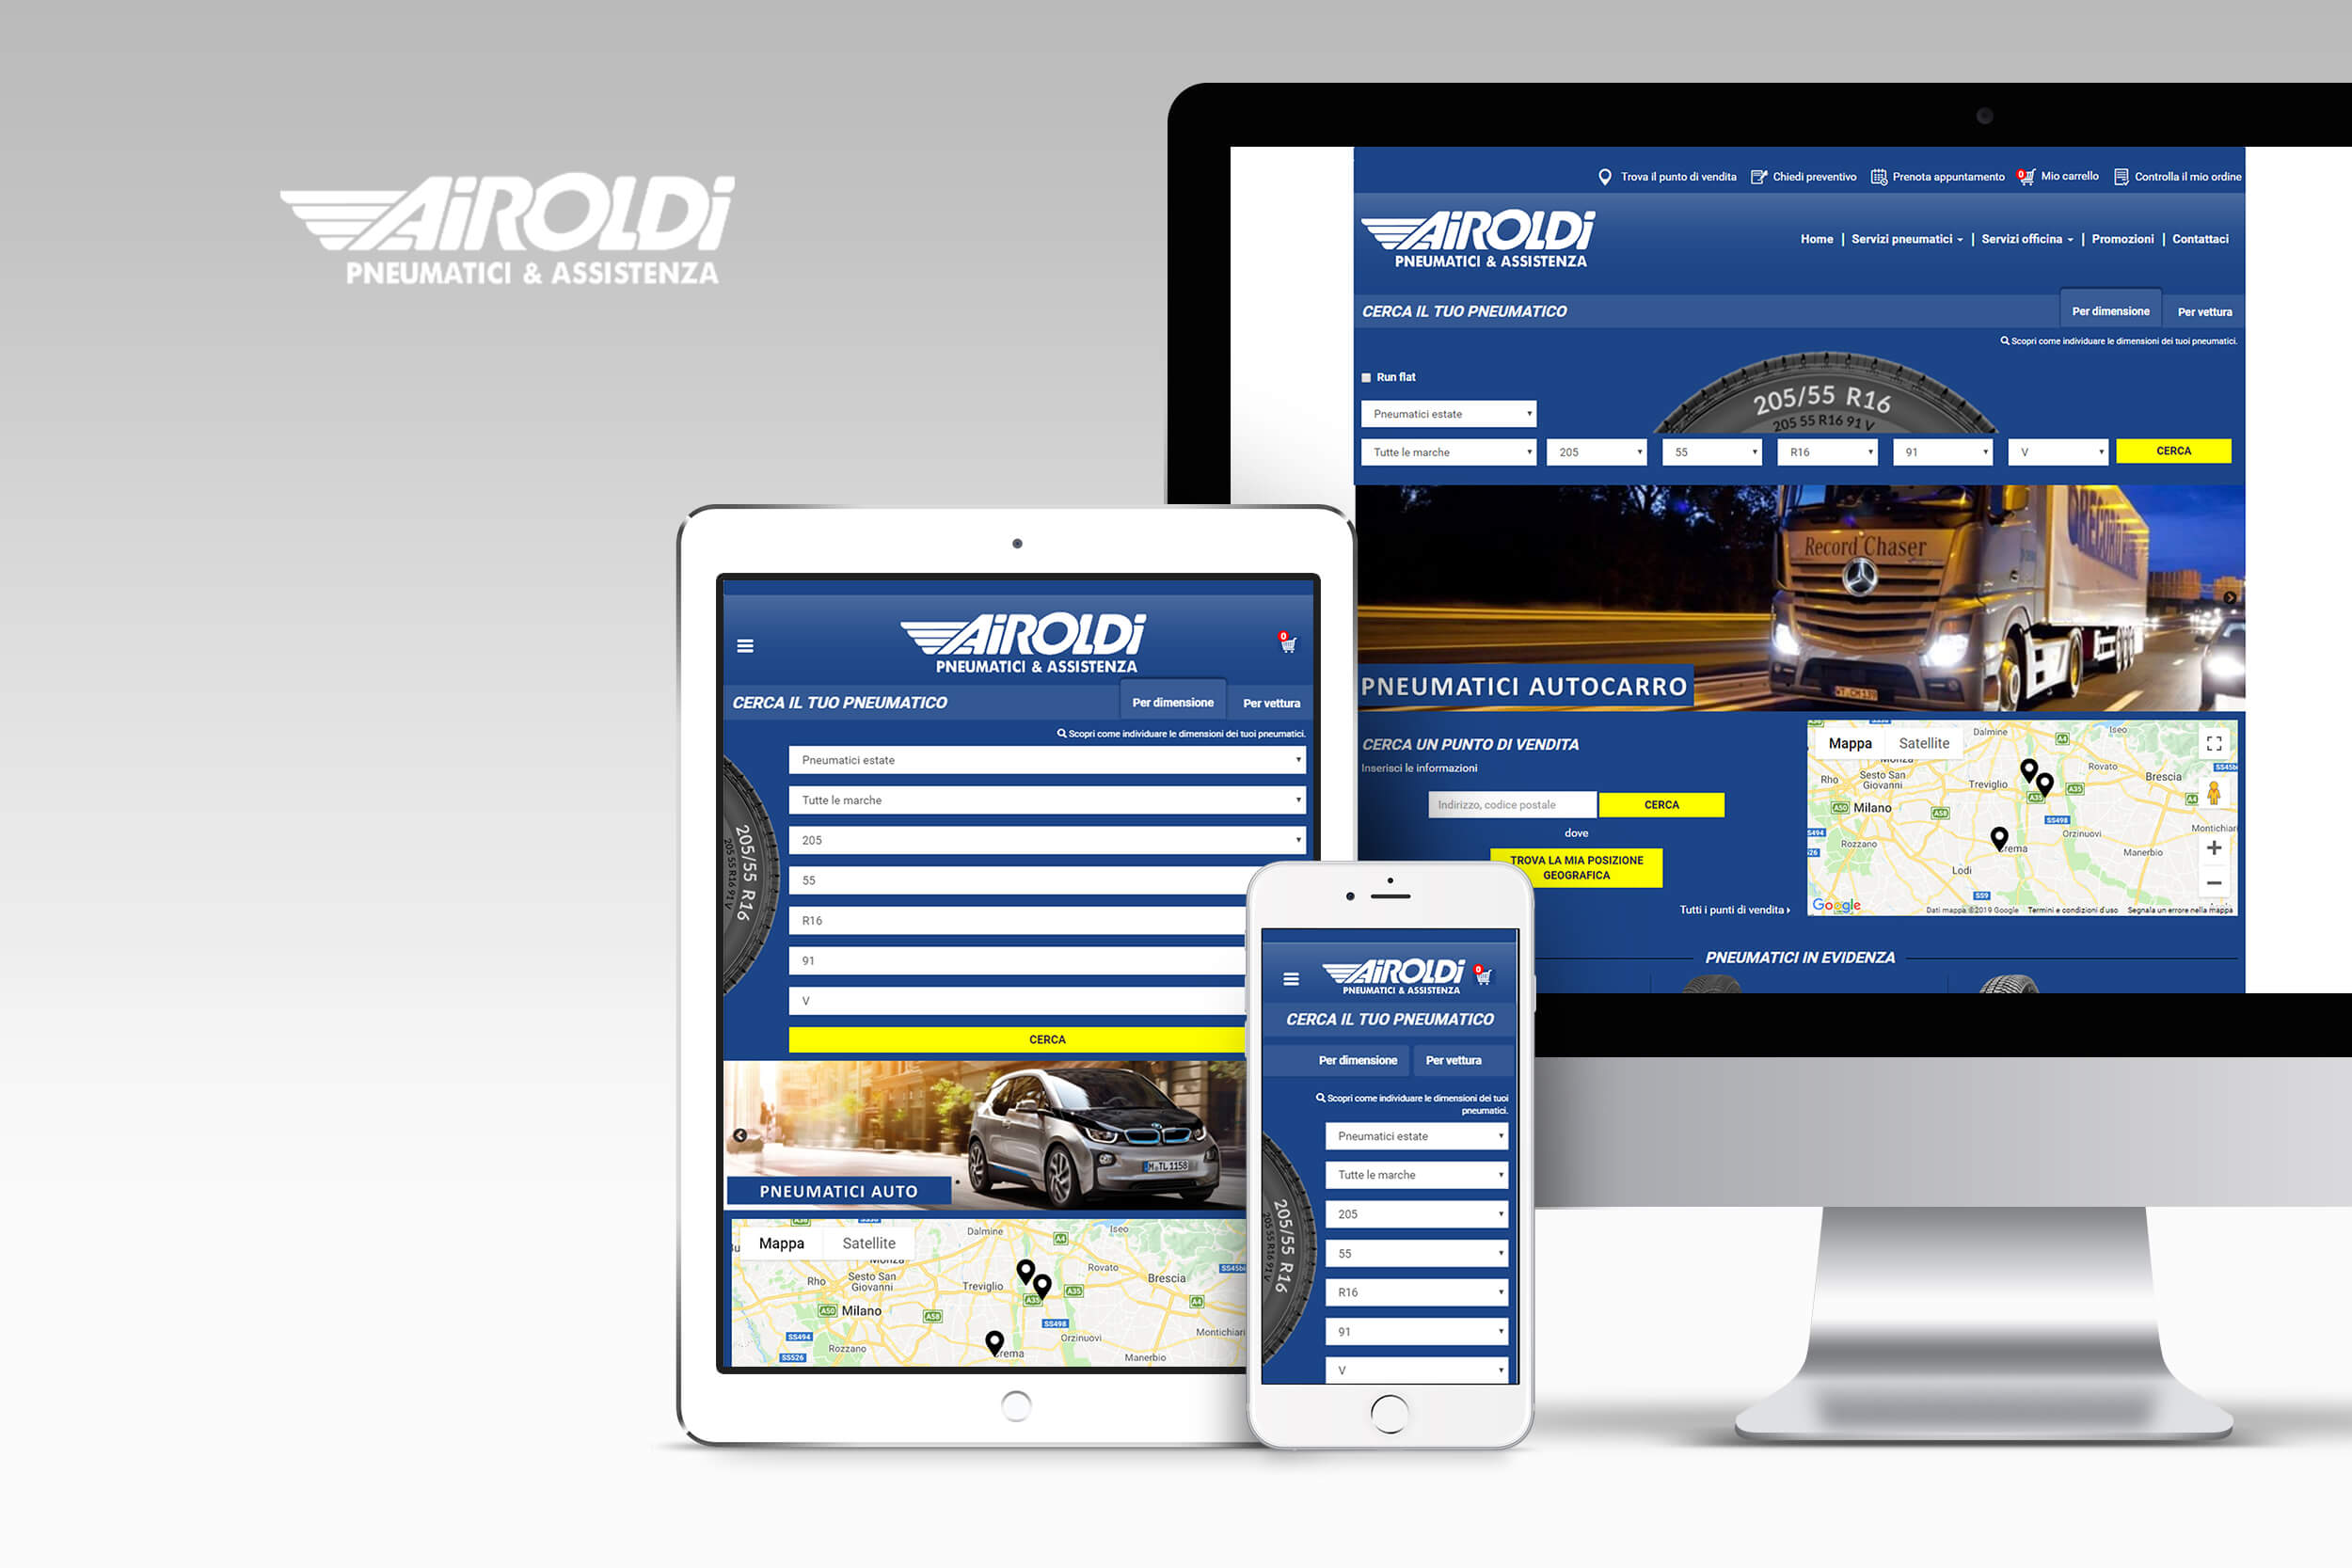 Page d'accueil du site Airoldi Pneumatici